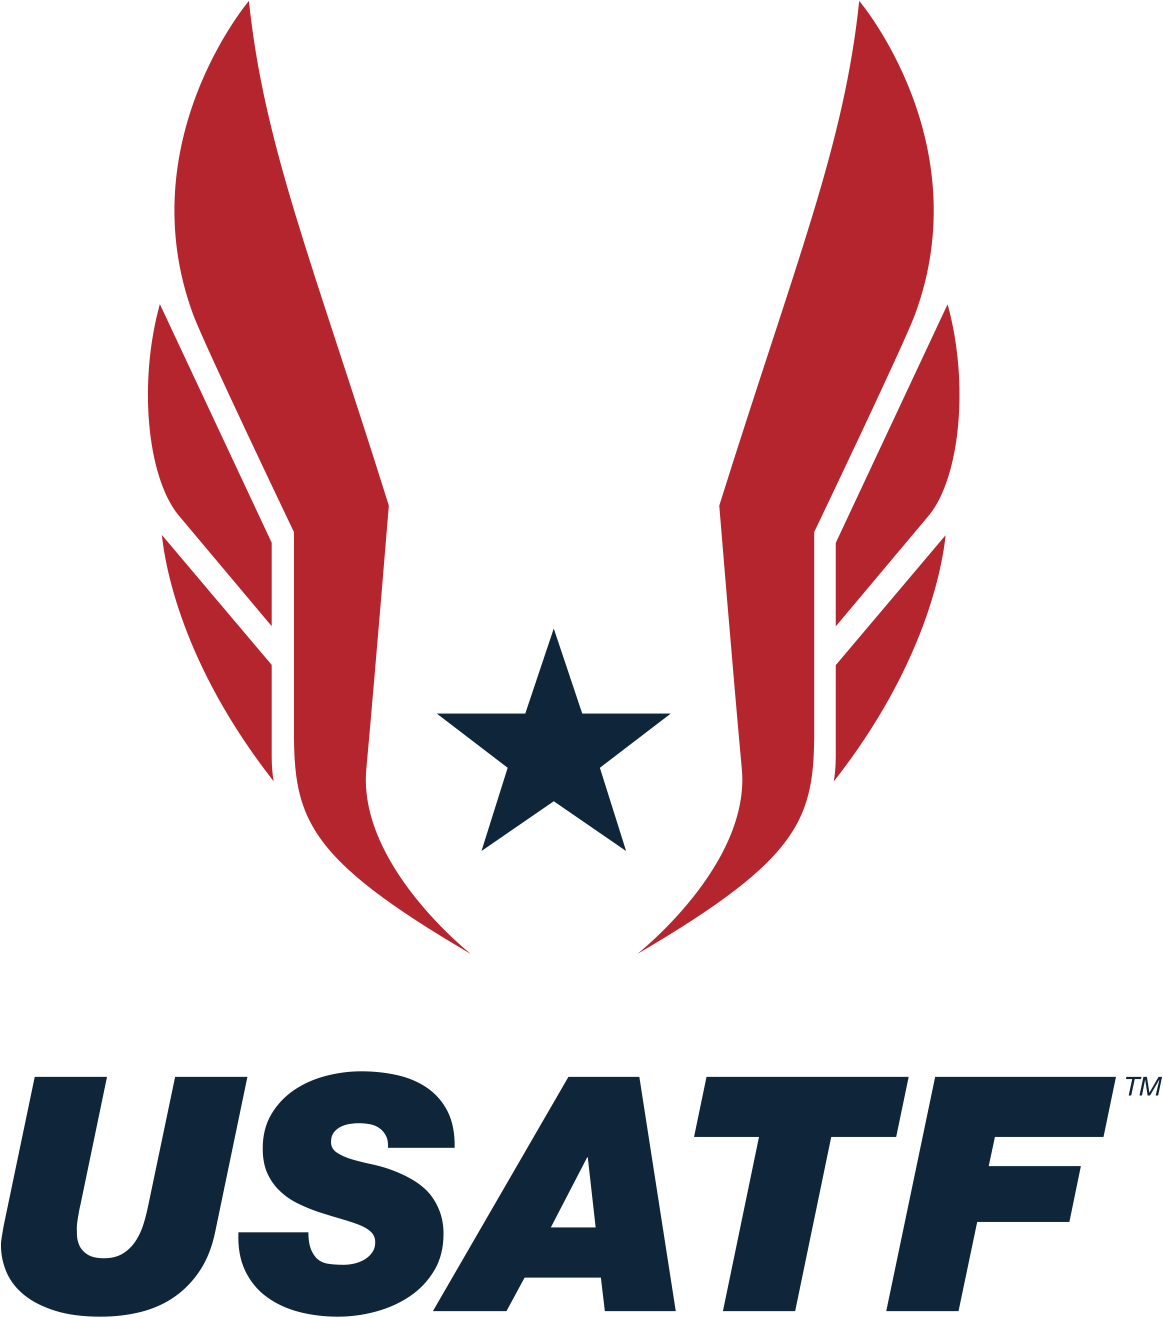 USATF Logo [USA Track & Field] png